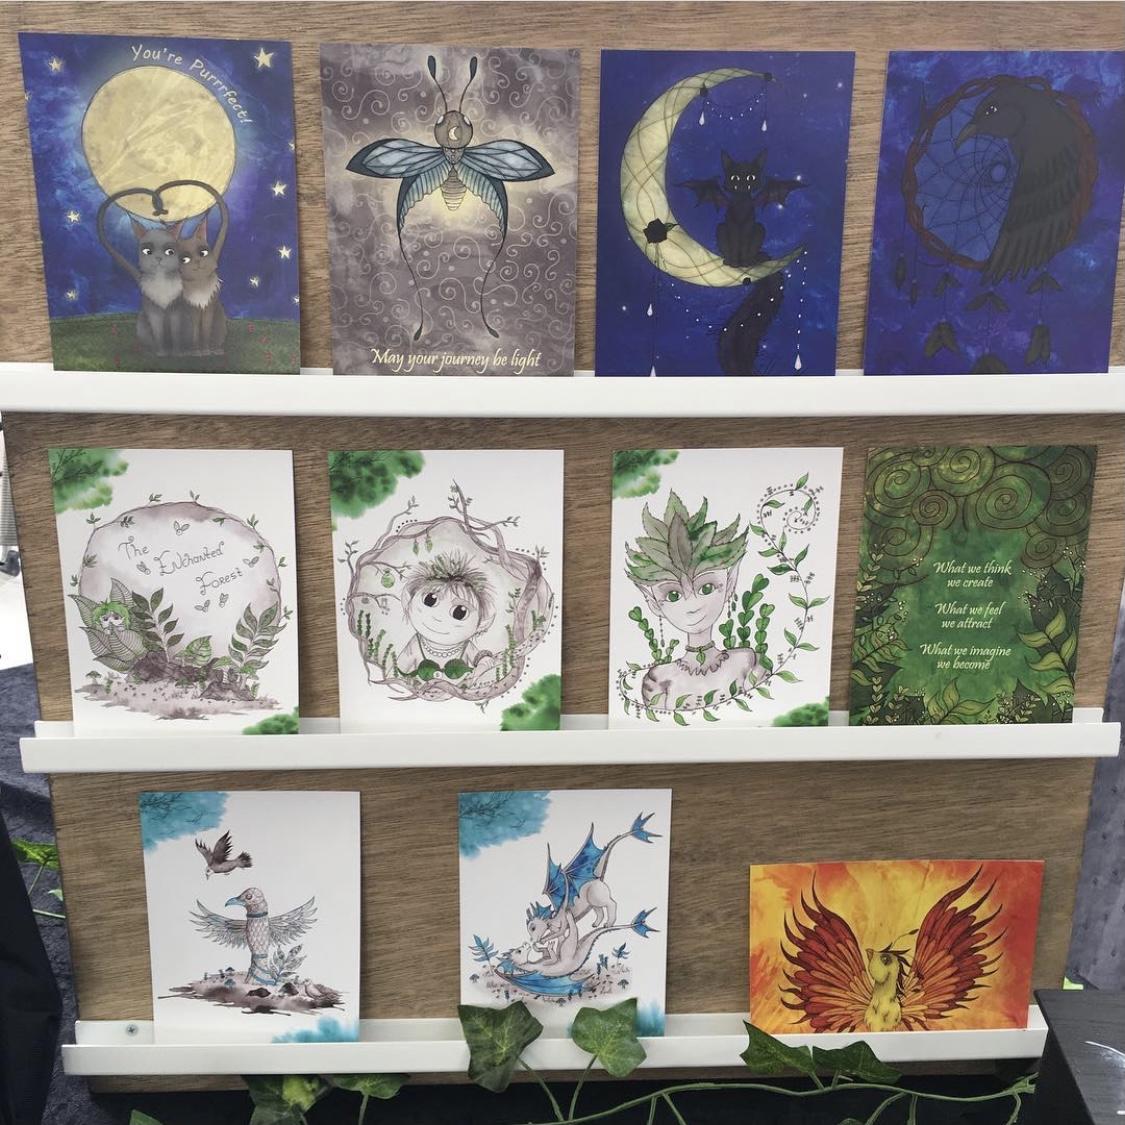 Ansichtkaarten A6 Prints Fantasy Natuur Magie